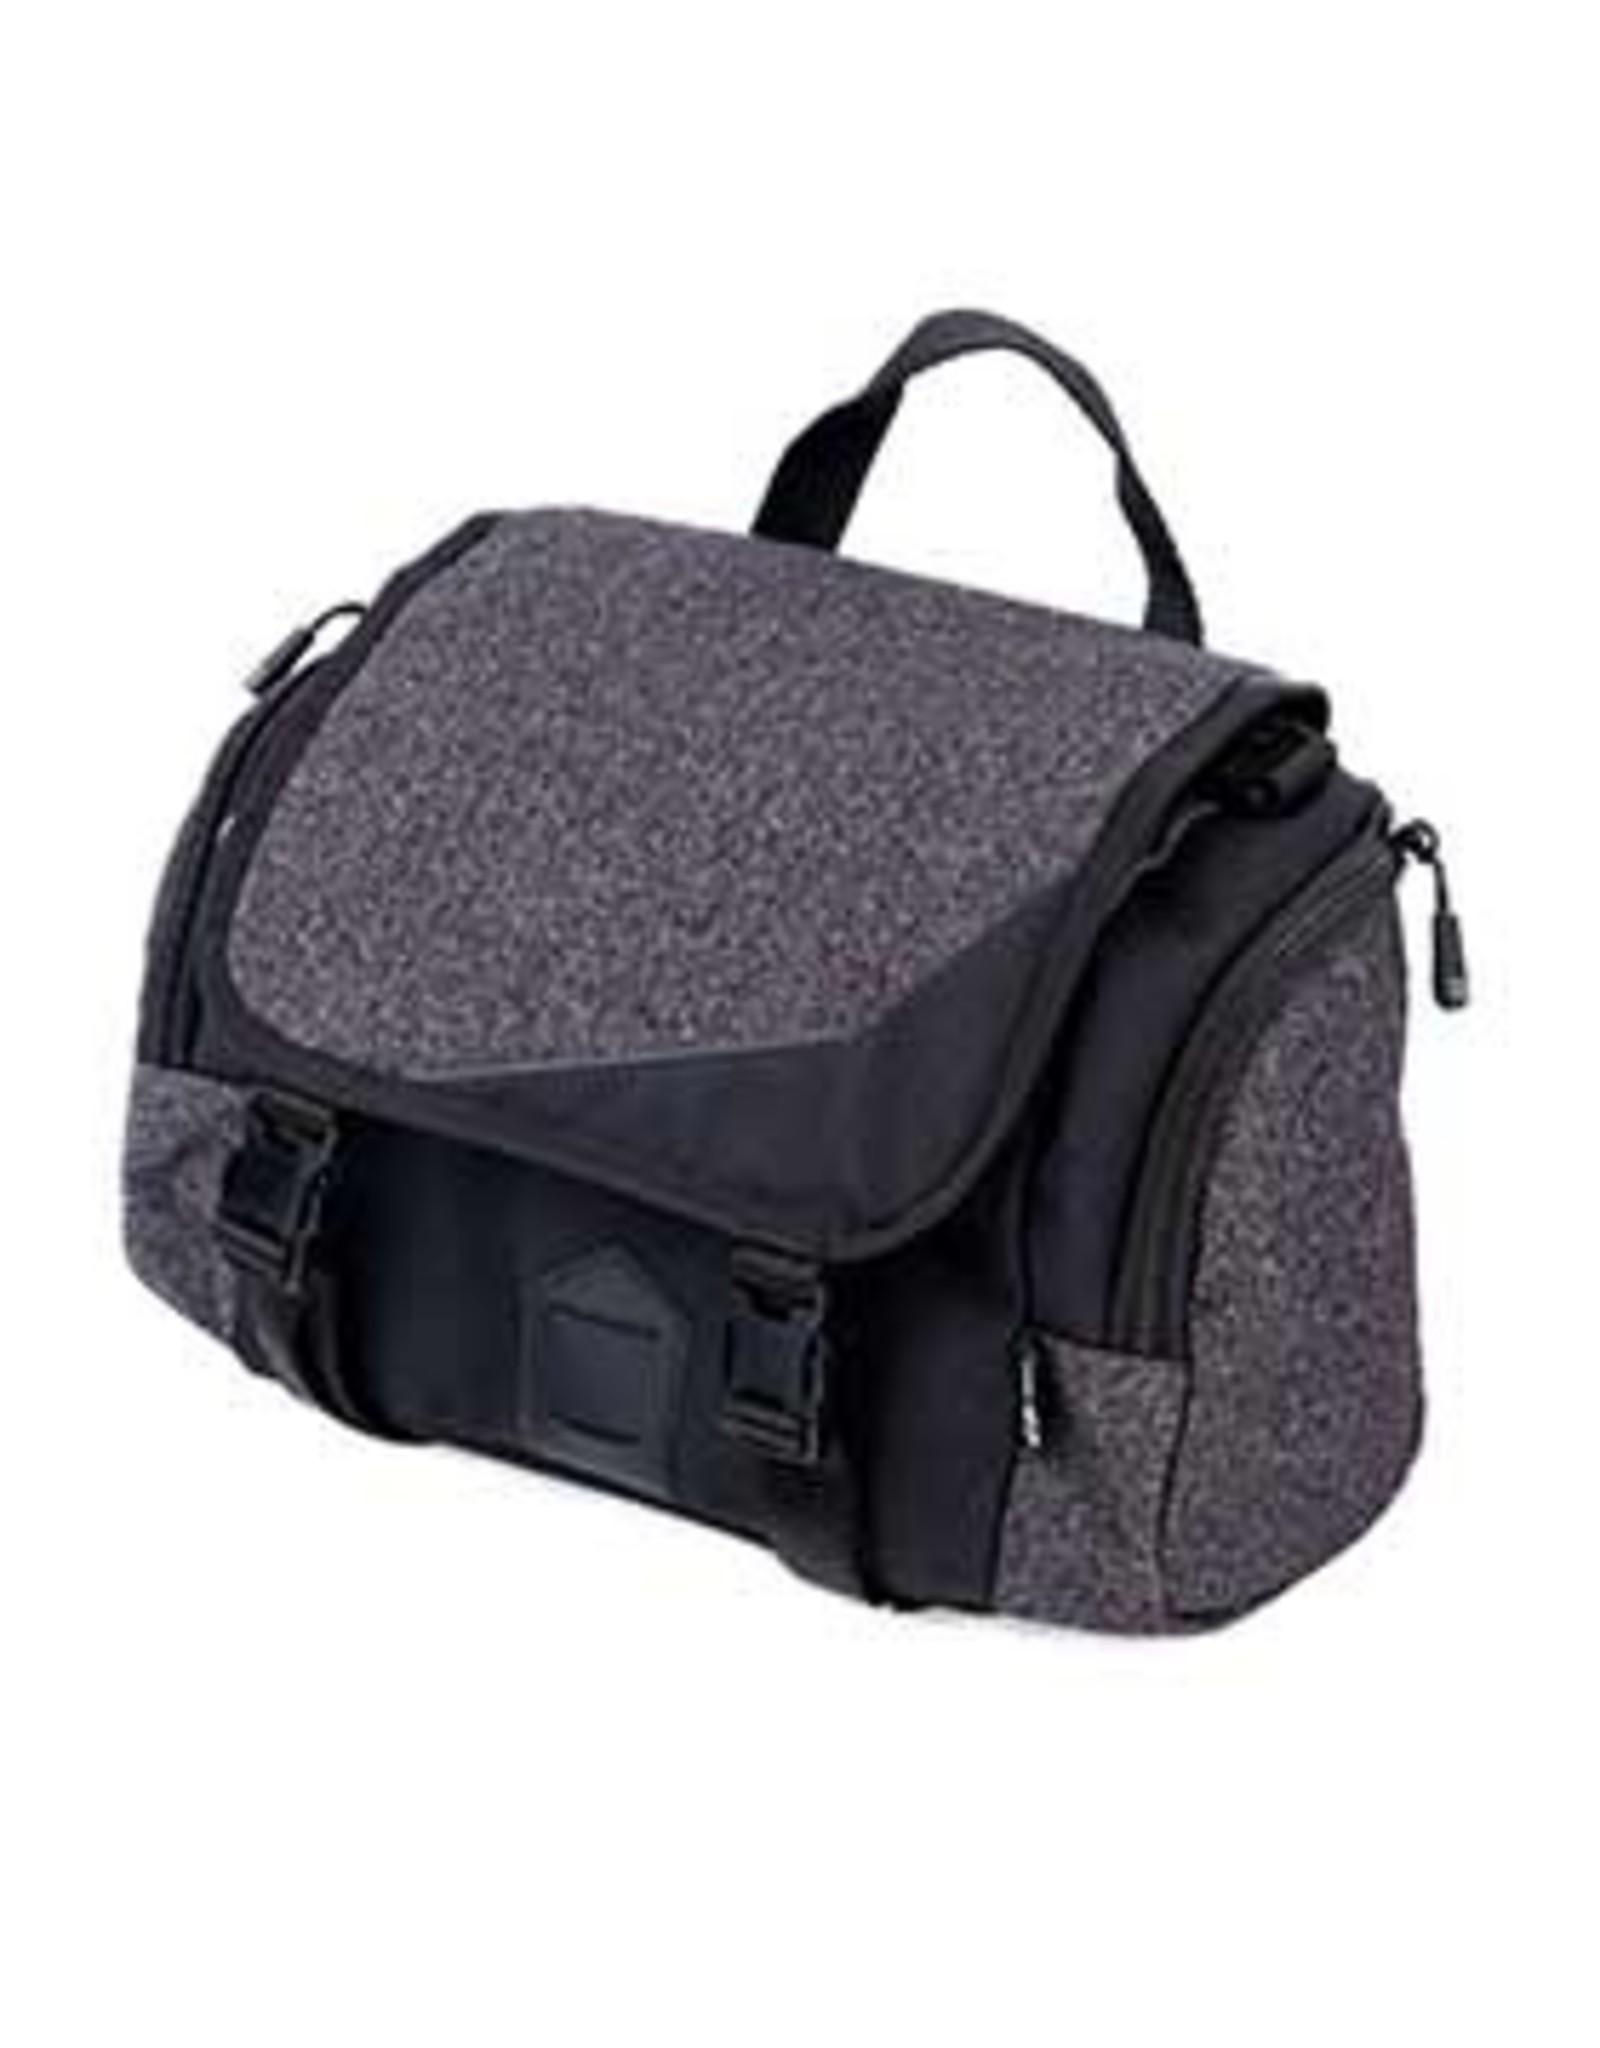 EVO Quick Release Handlebar Bag, Black